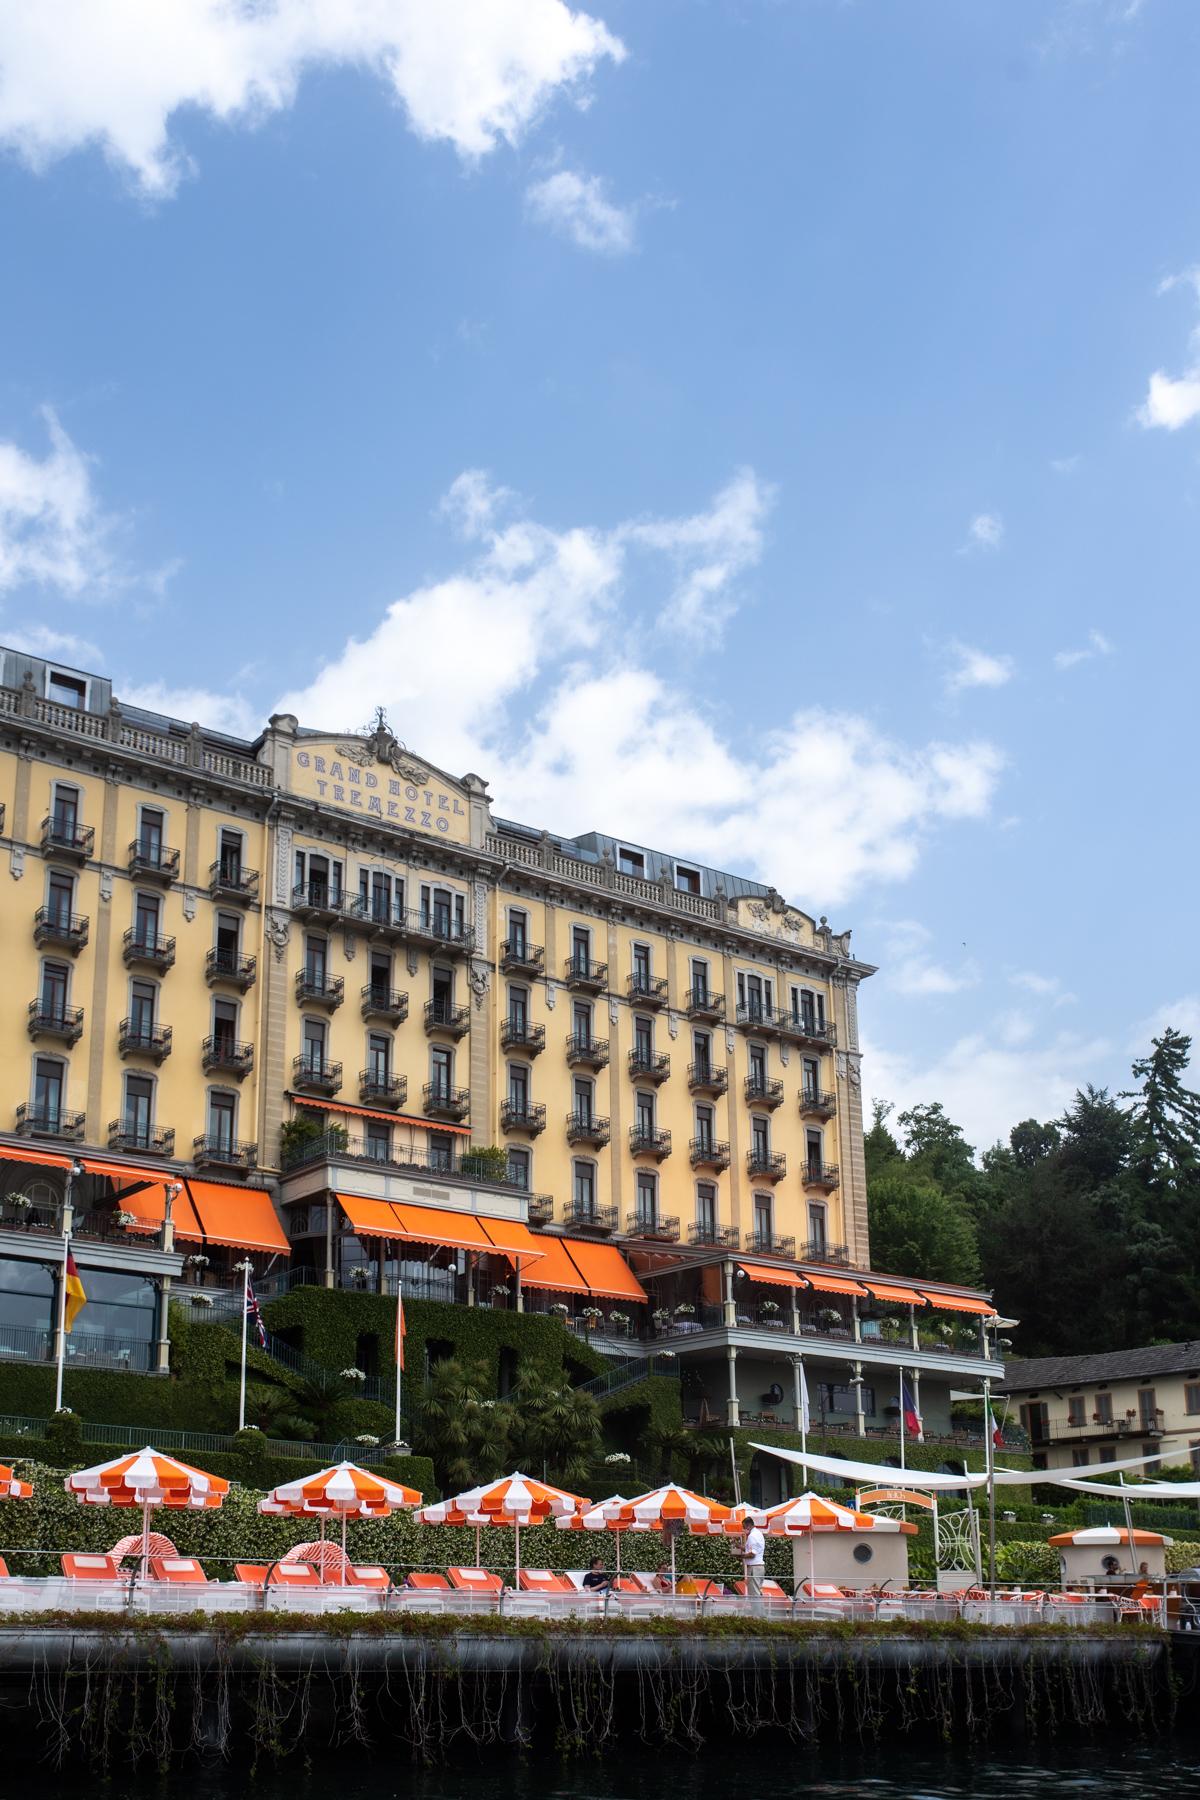 Stacie Flinner x Grand Hotel Tremezzo x Maupin Travel-39.jpg